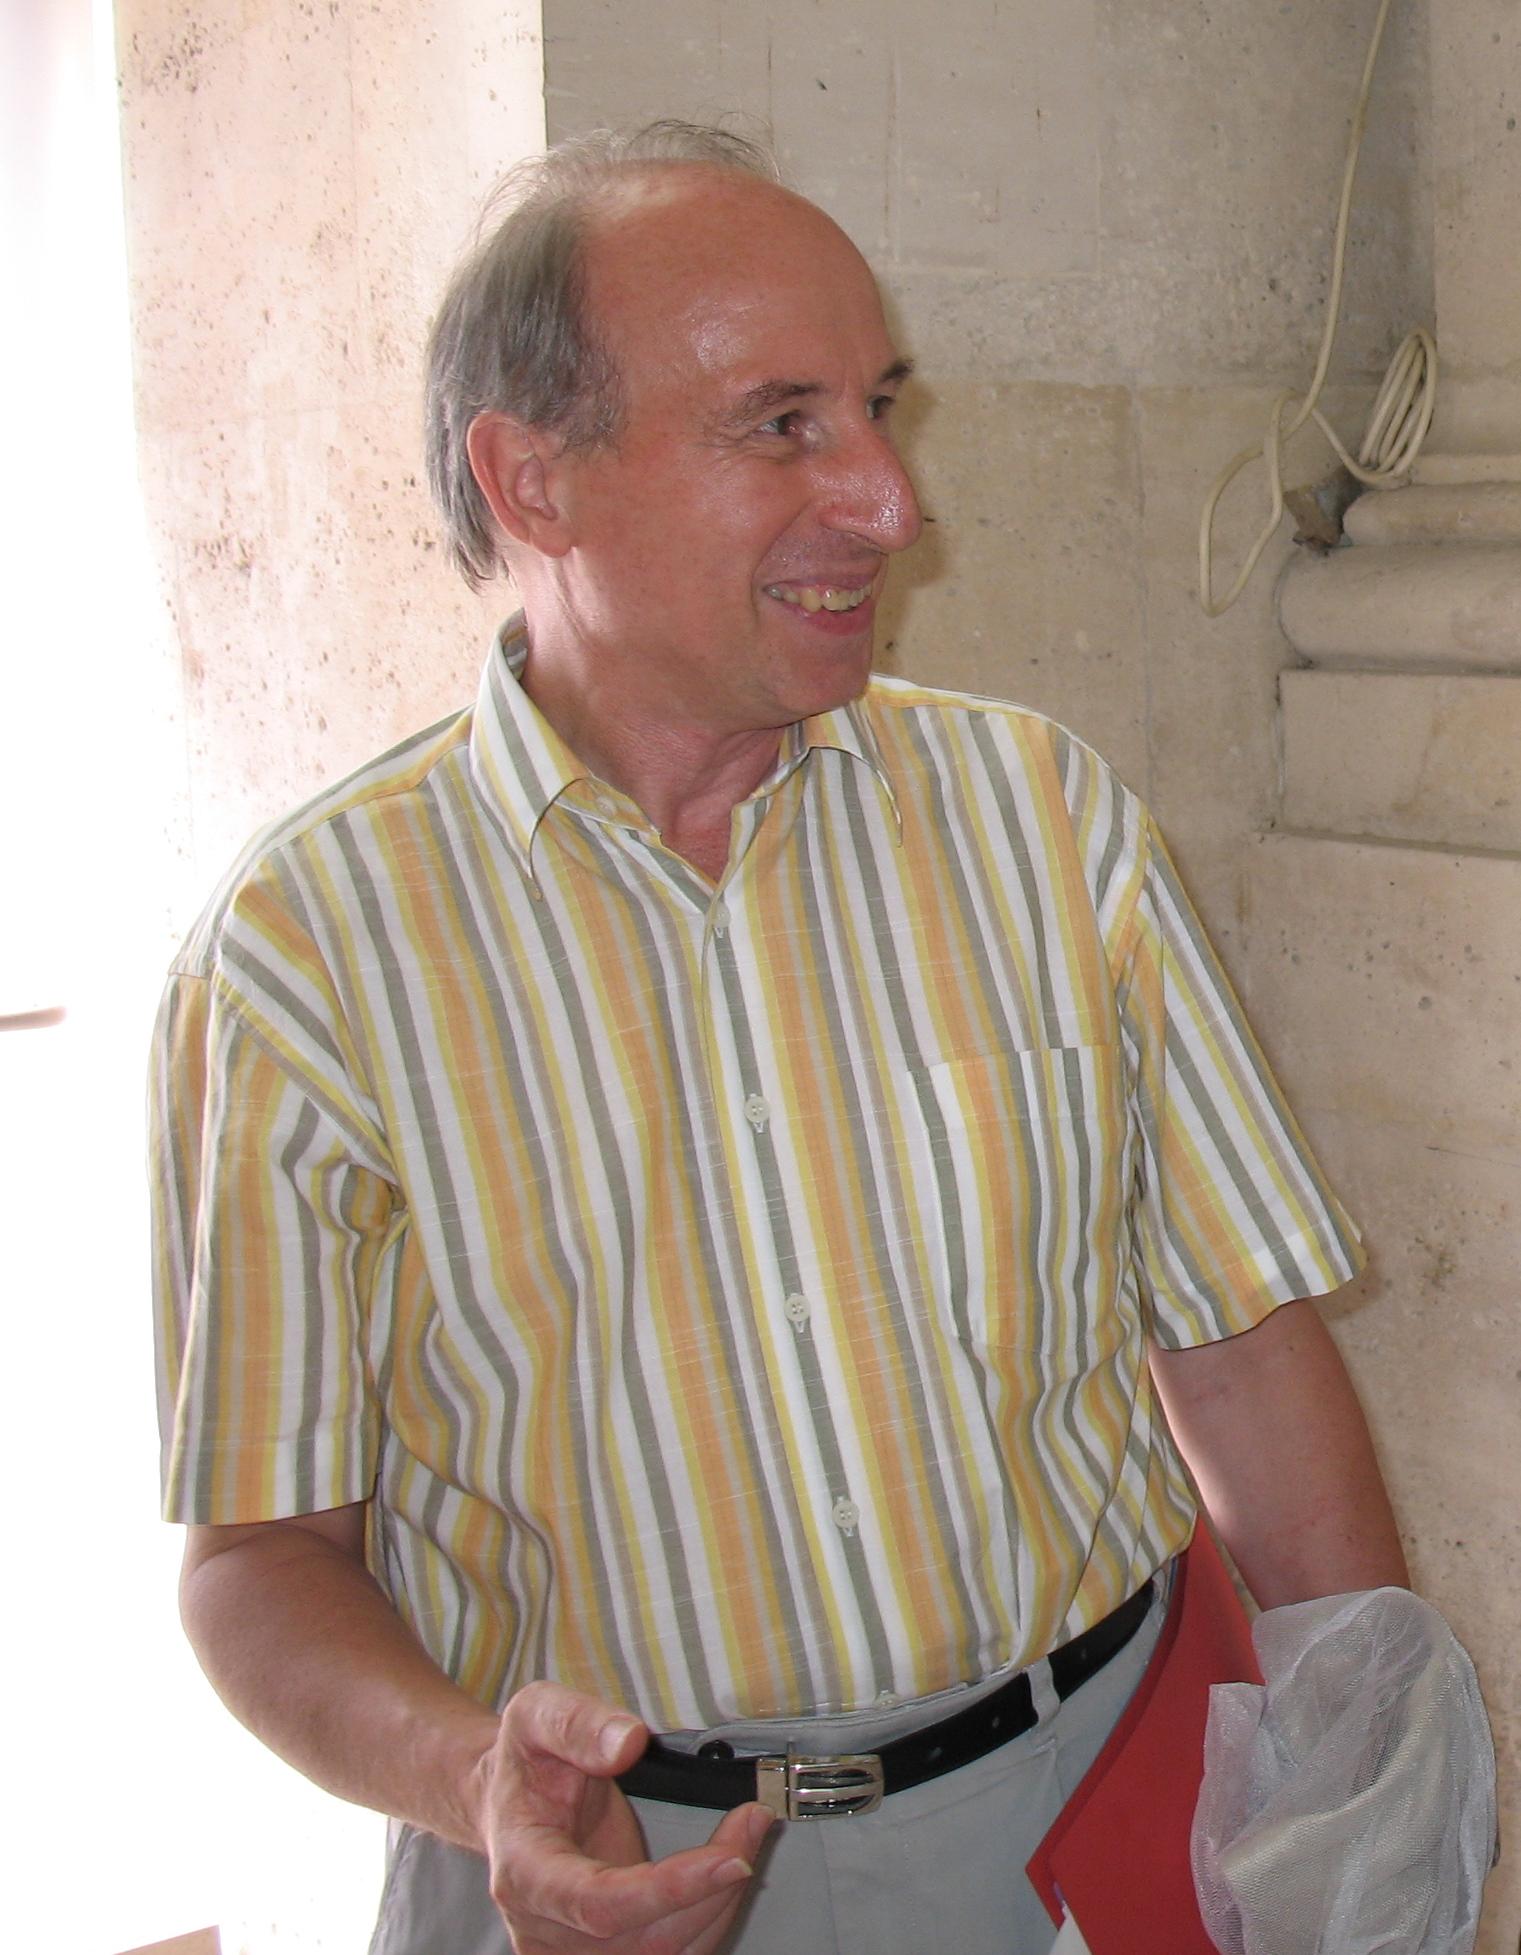 Jean Paul Leclercq |www.artextiles.org